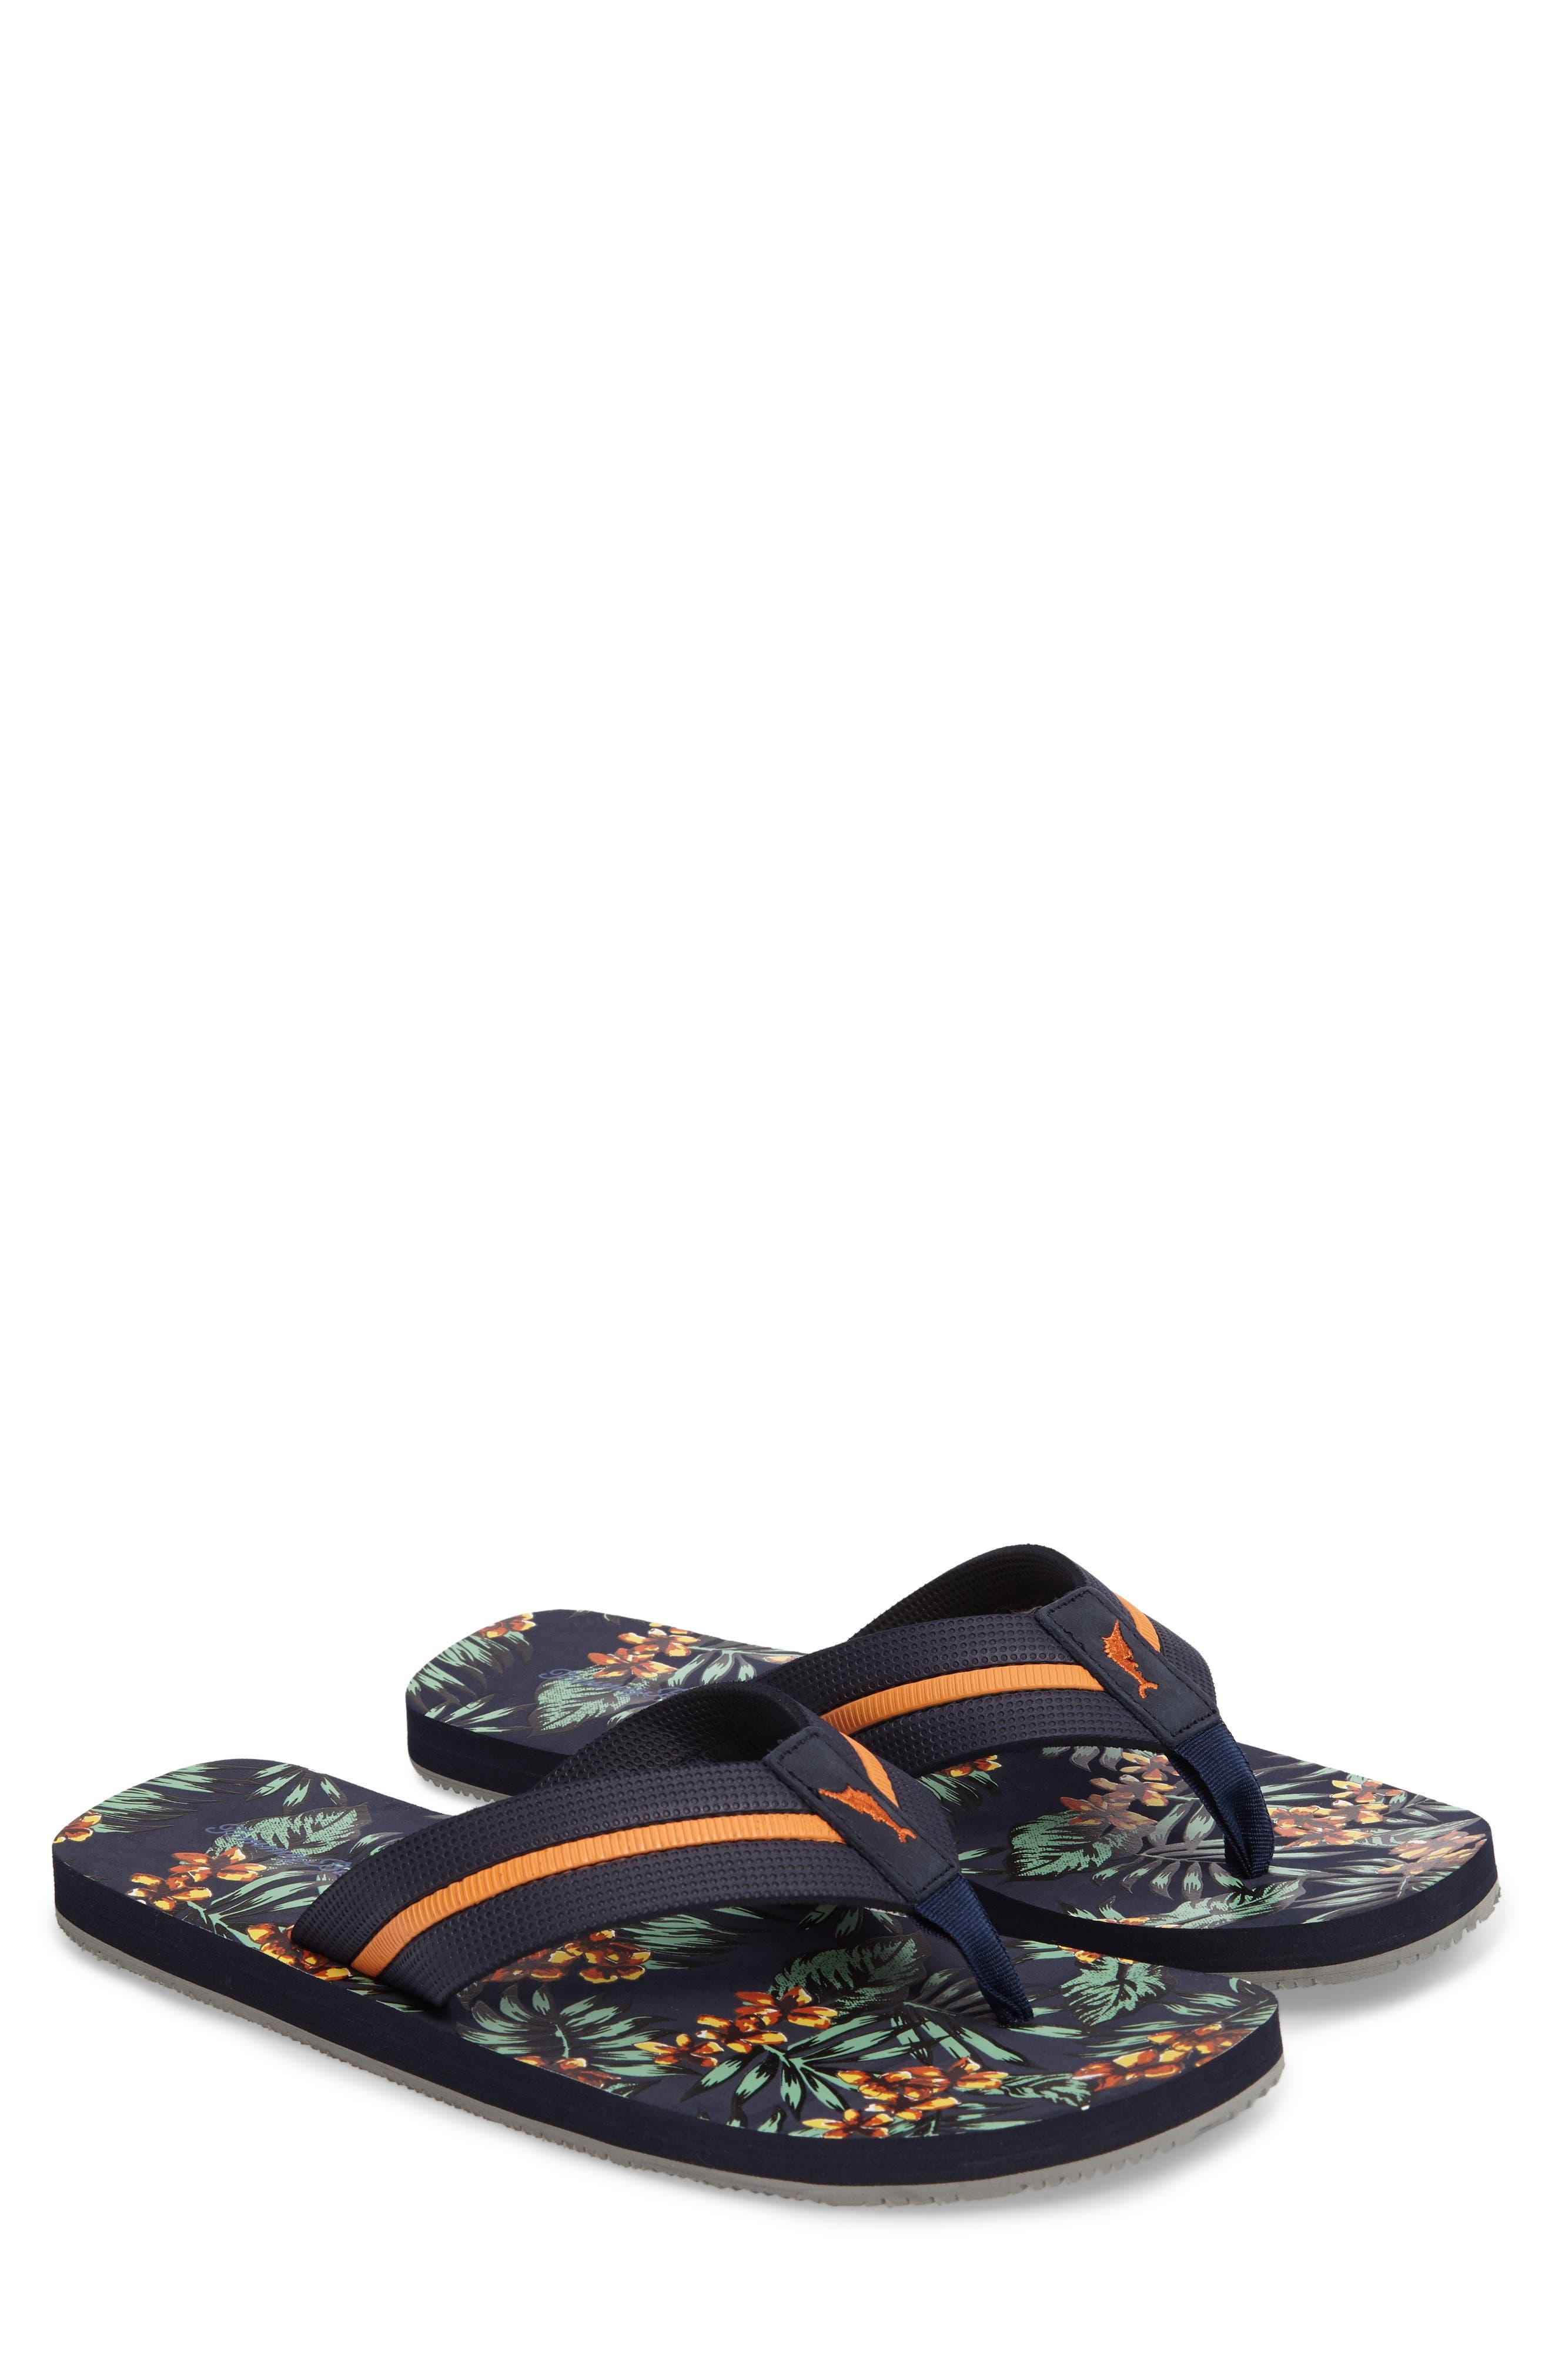 Taheeti Flip Flop,                         Main,                         color, Ocean Deep